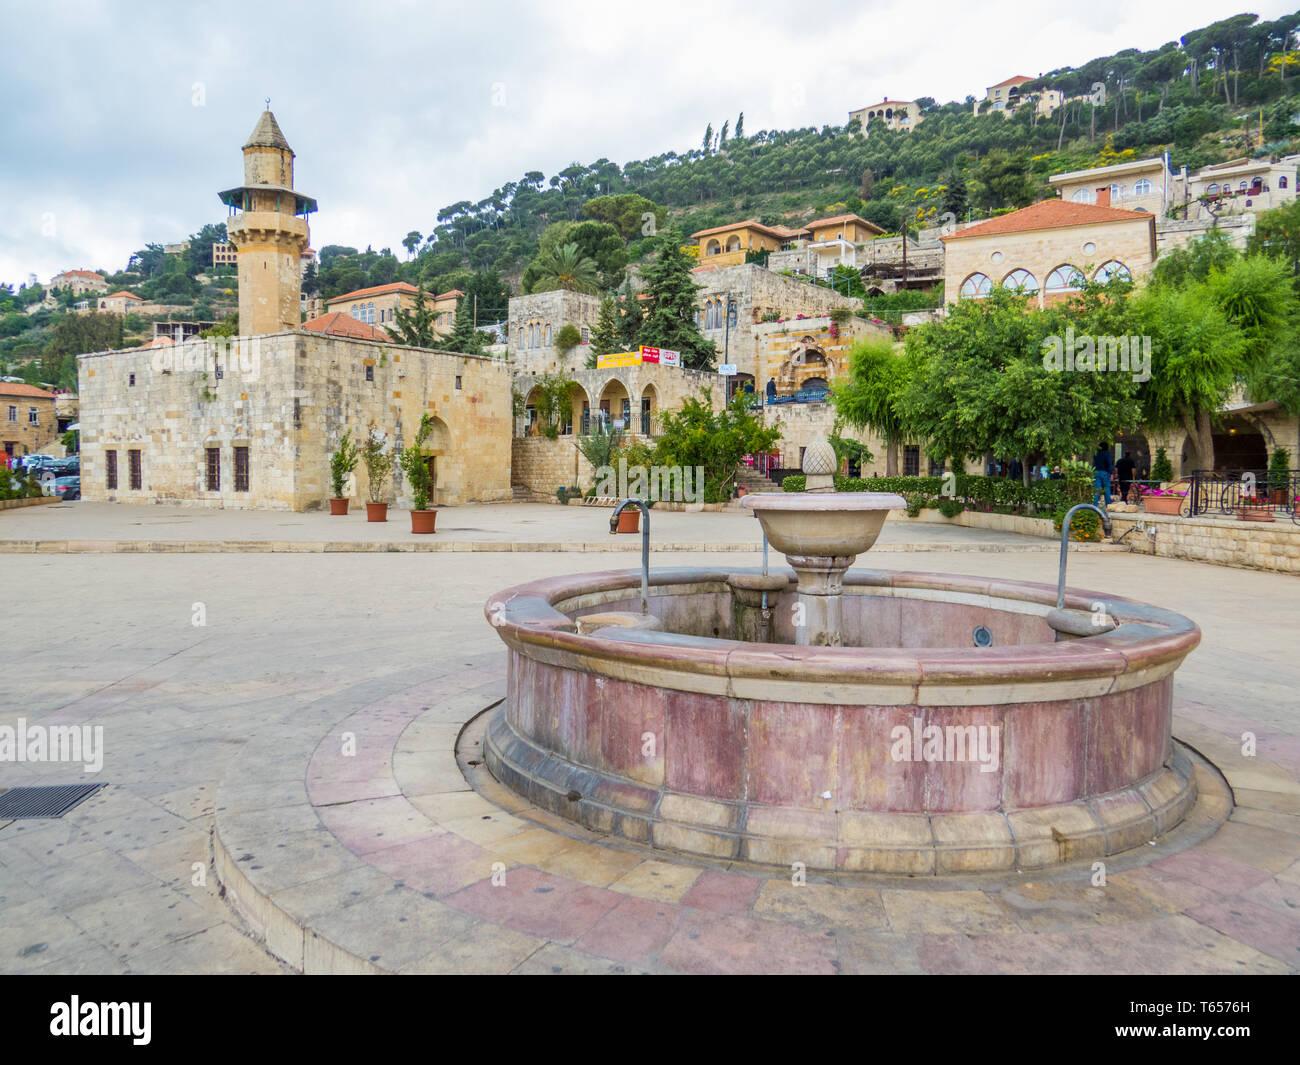 DEIR AL-QAMAR, LEBANON - MAY 20, 2017: View of the Fakhreddine II Palace and the village's main square. - Stock Image